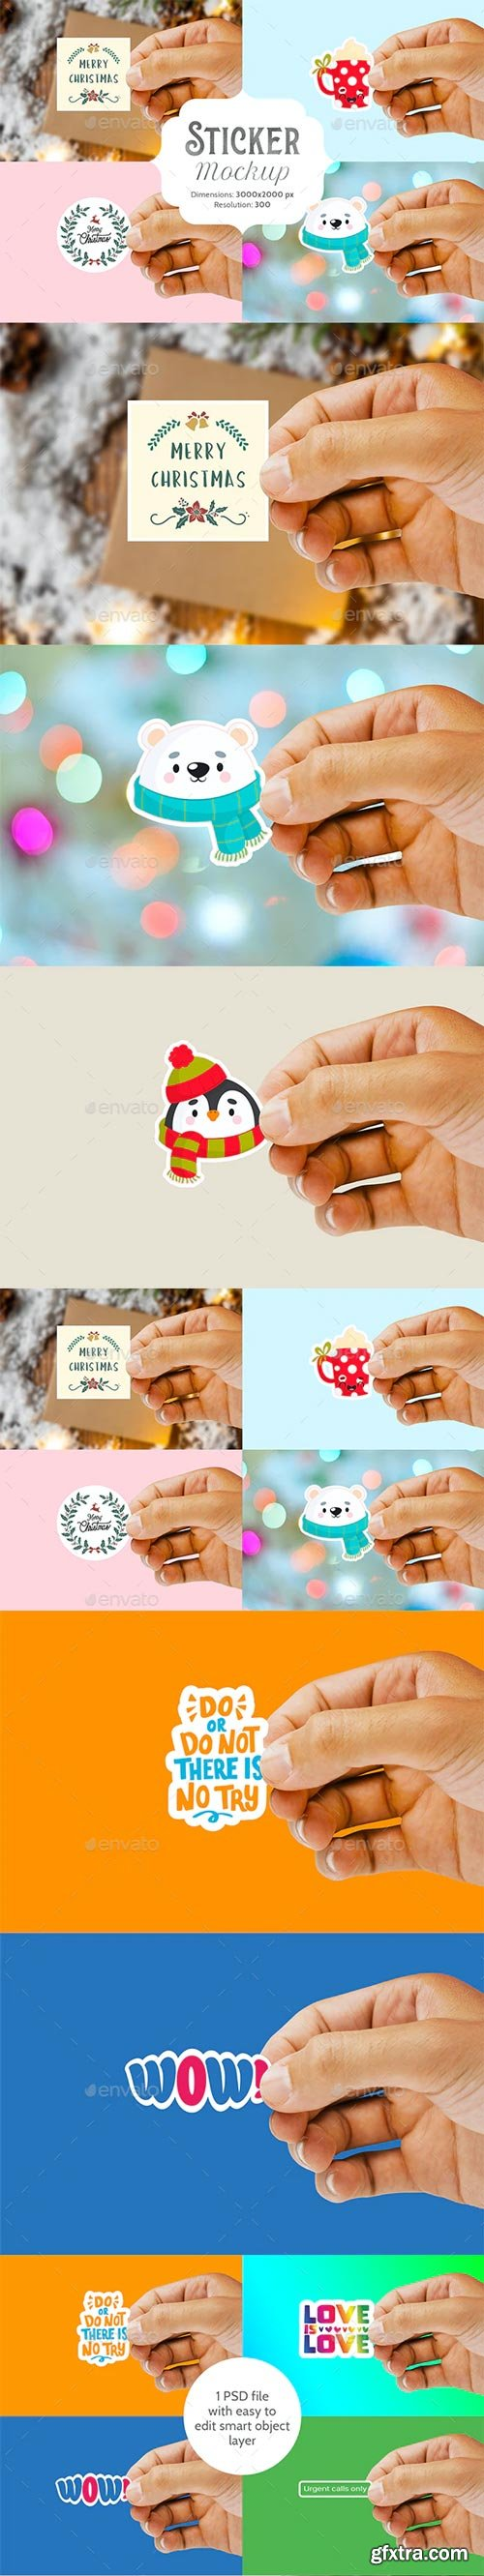 GraphicRiver - Sticker Mockup - 29472527